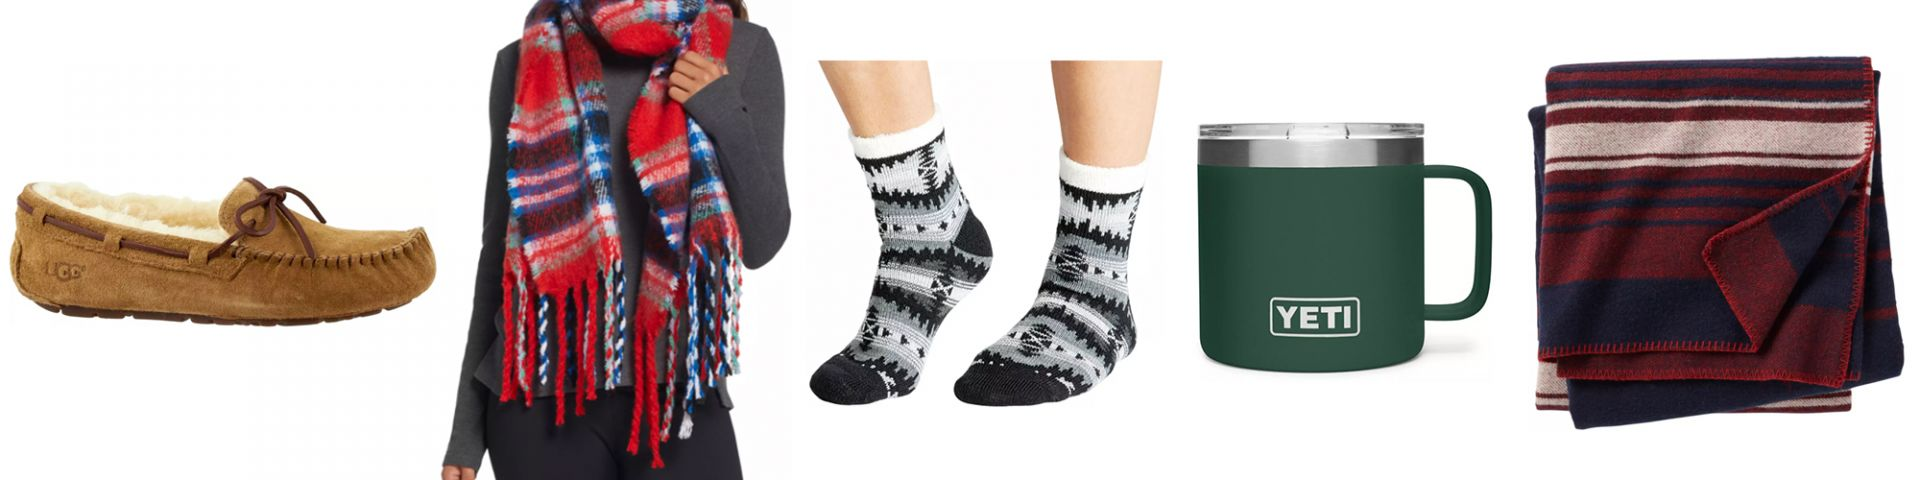 UGG slippers blanket scarf cabin socks YETI mug blanket